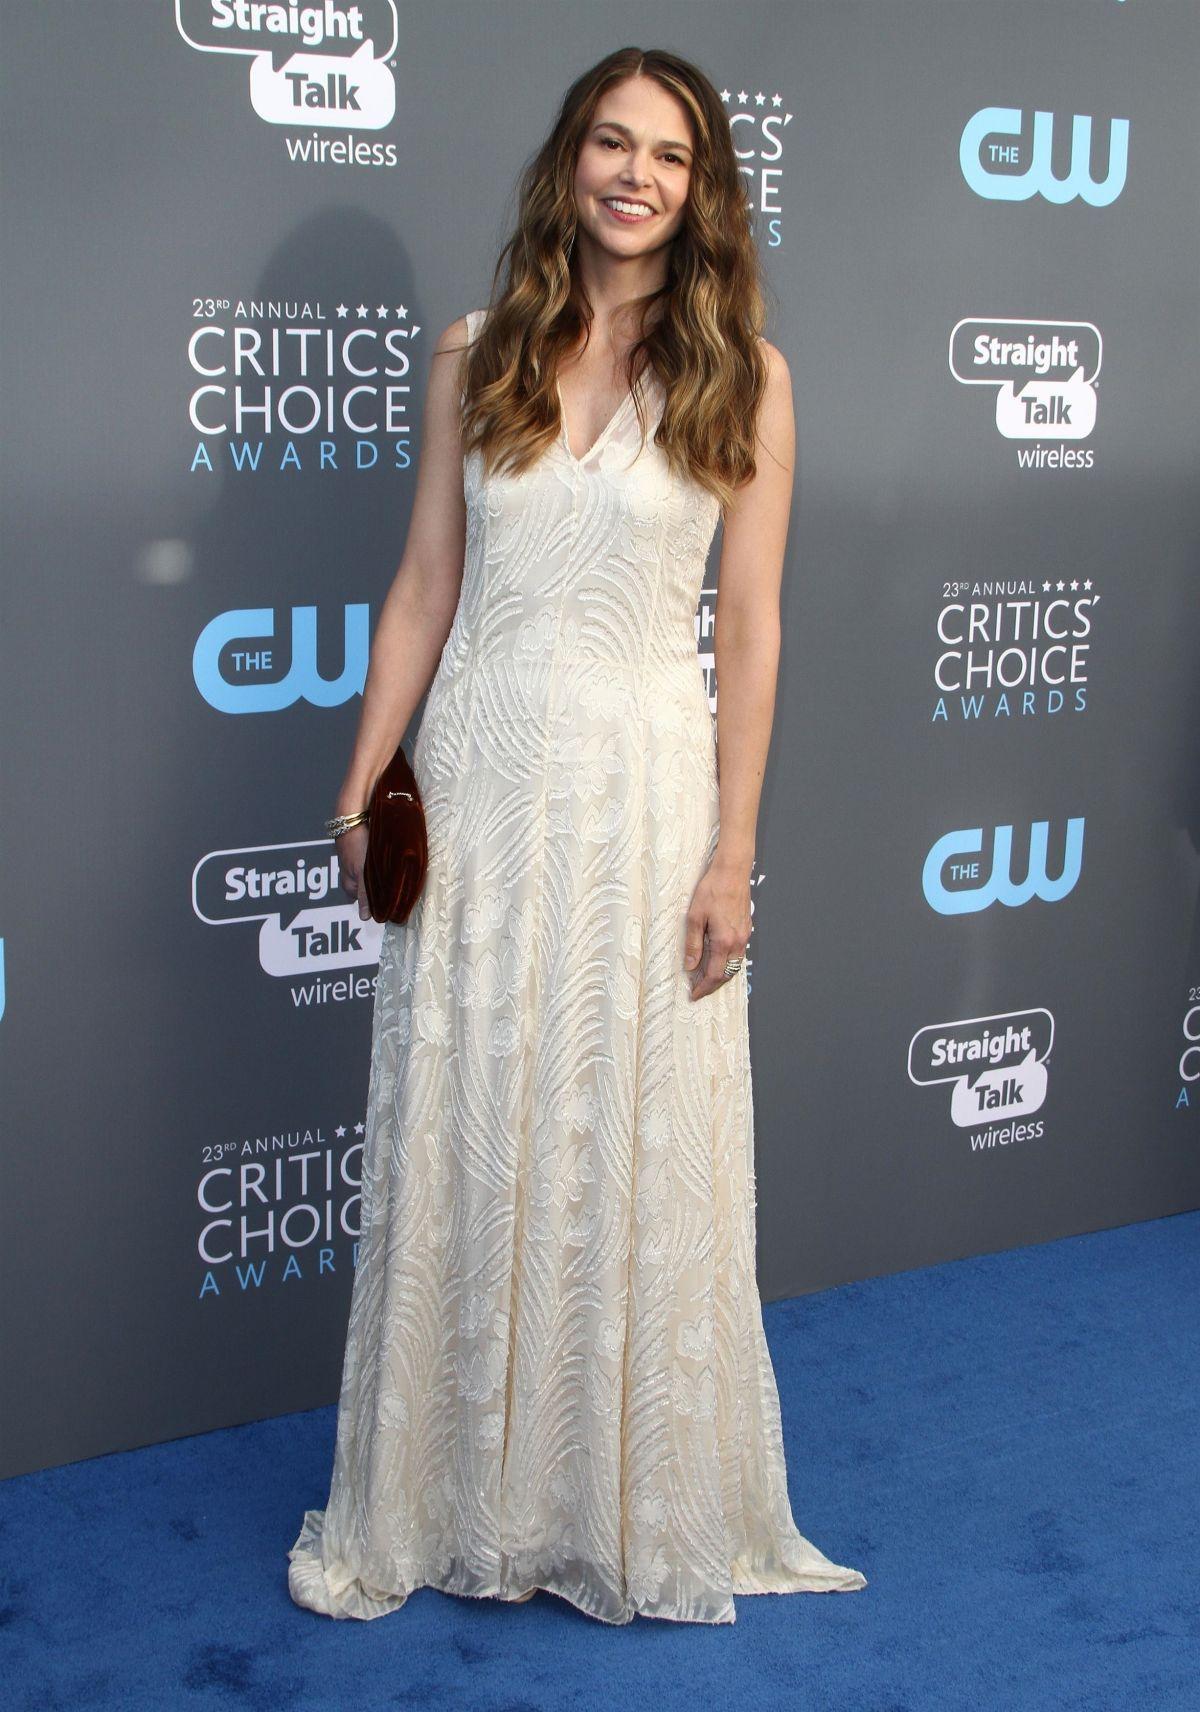 critics choice awards - photo #47